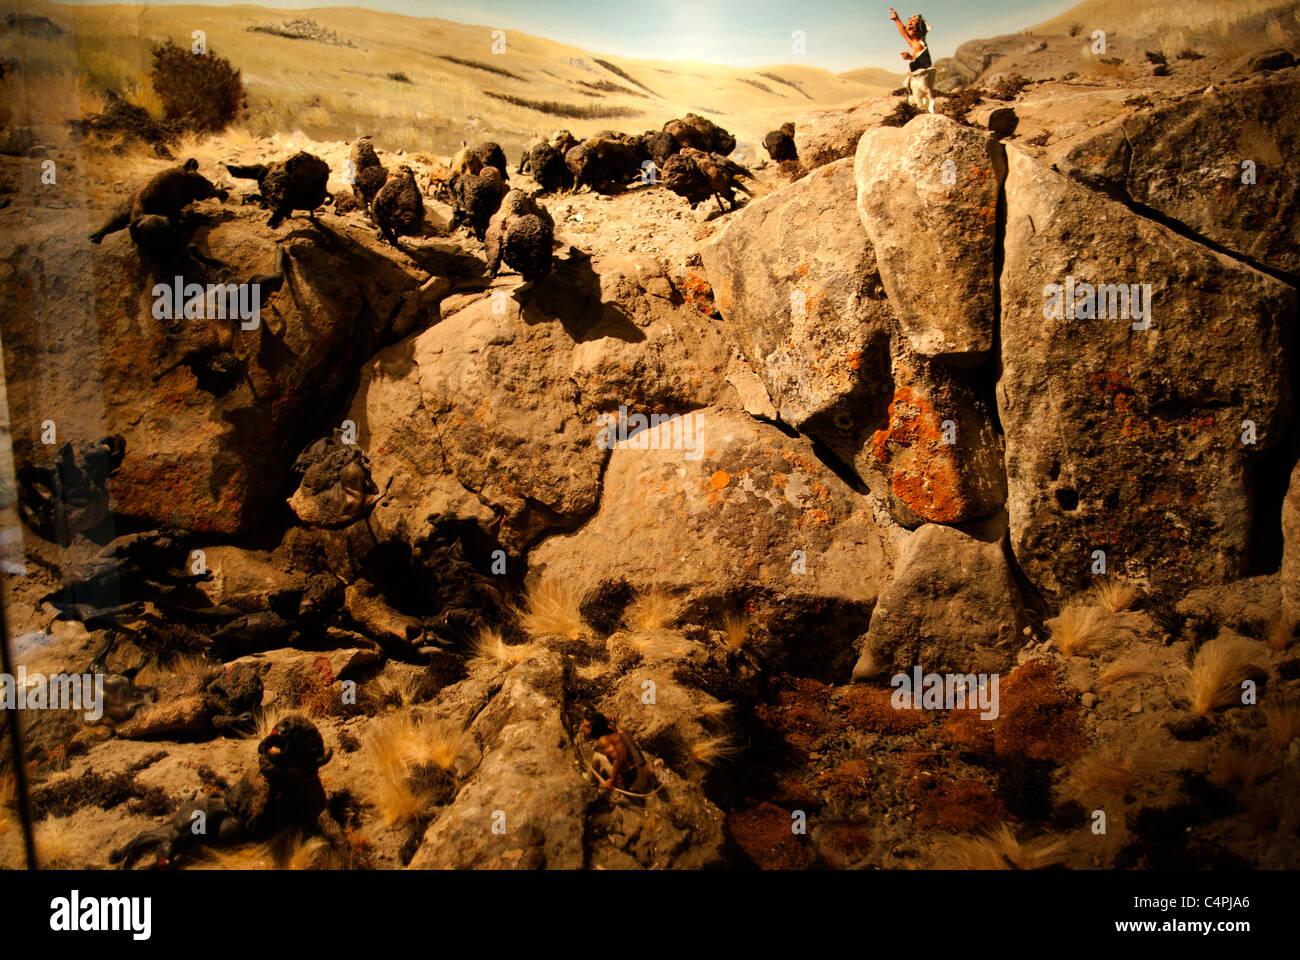 Diorama of Plains Indian buffalo culture, Head-Smashed-In Buffalo Jump, Alberta, Canada - Stock Image